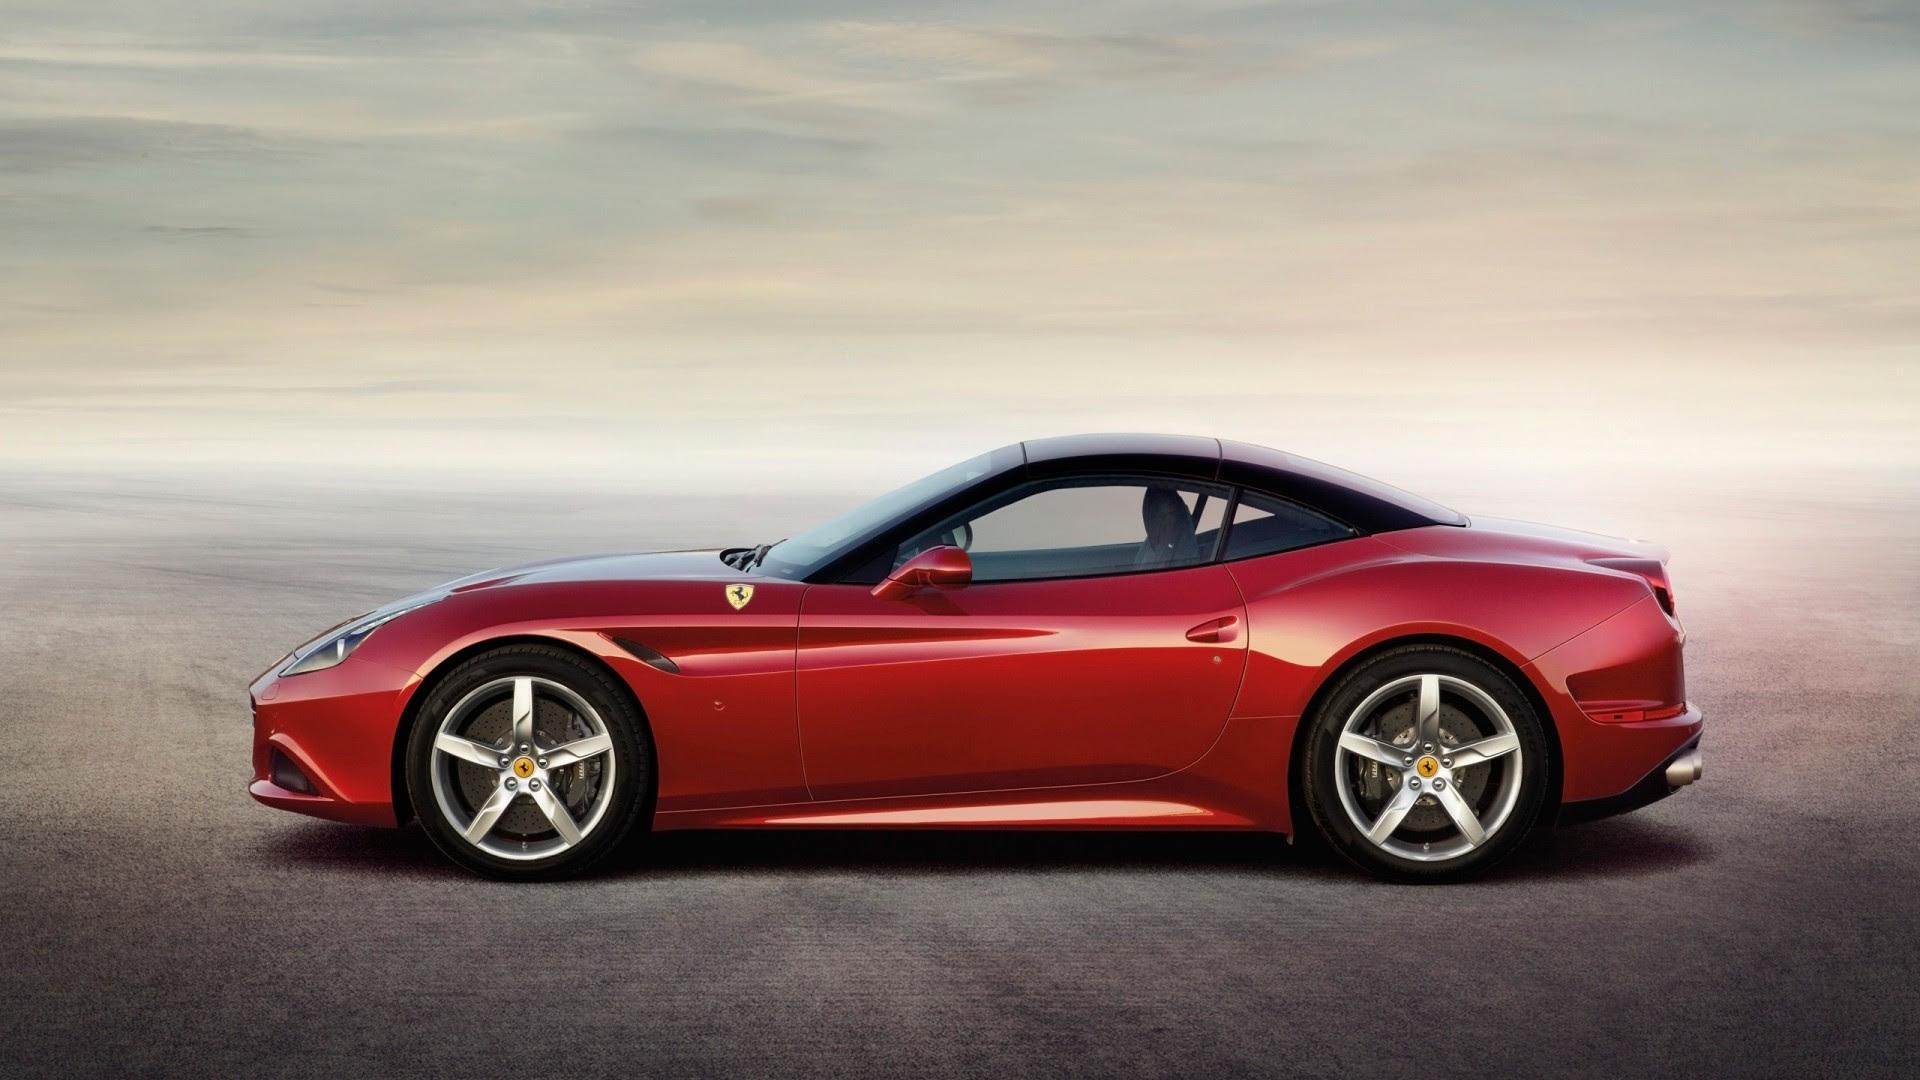 2014 Ferrari California T 6 Wallpaper   HD Car Wallpapers ...